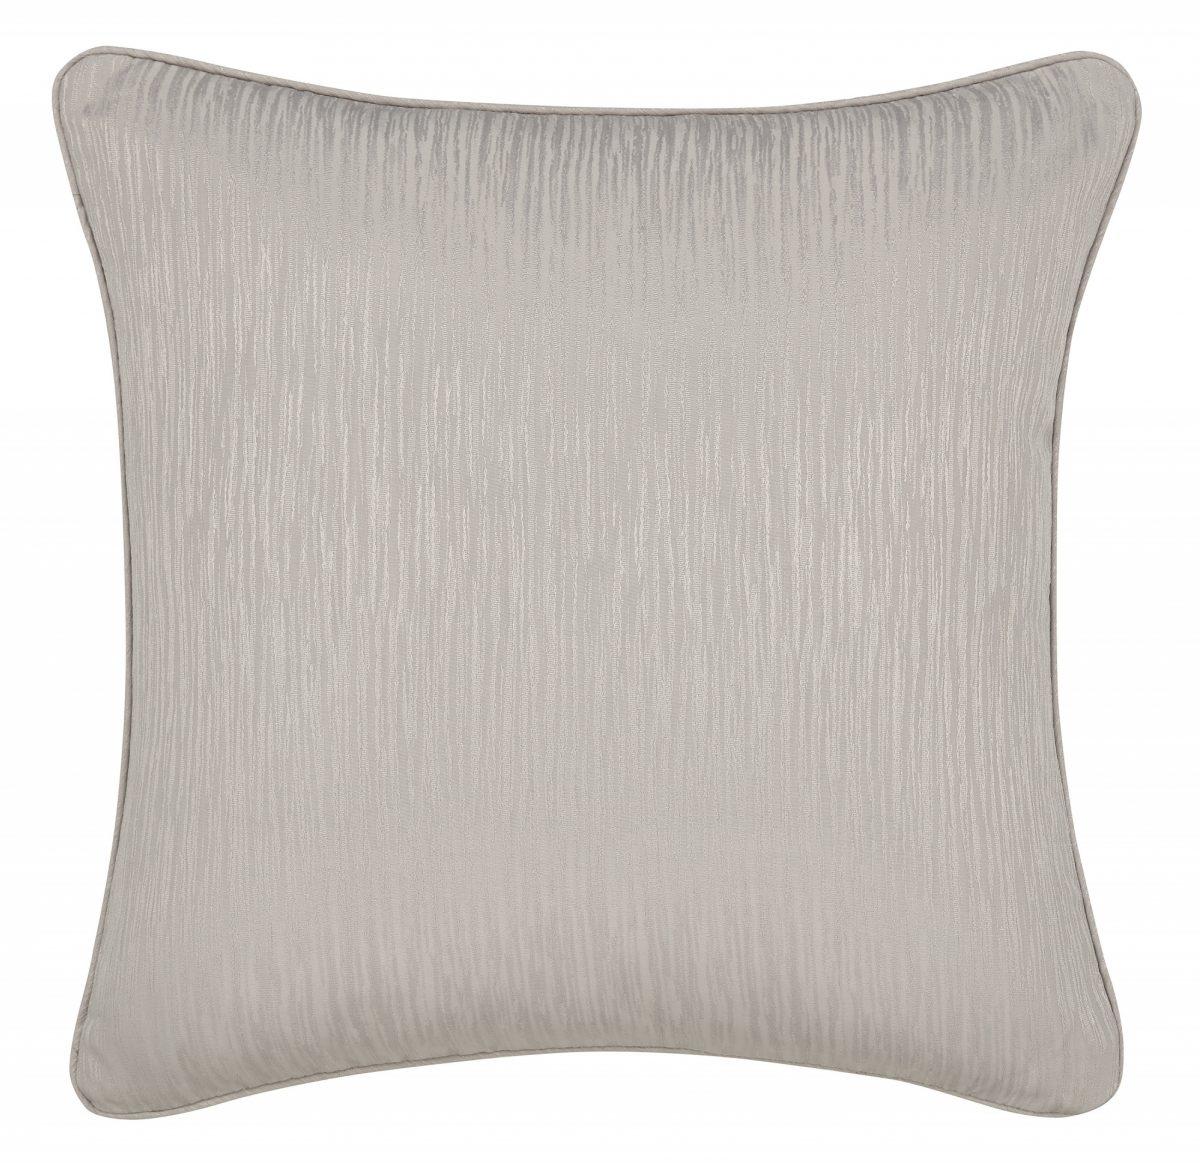 Pb Hotel Barcelo Cashmere Cushion Co